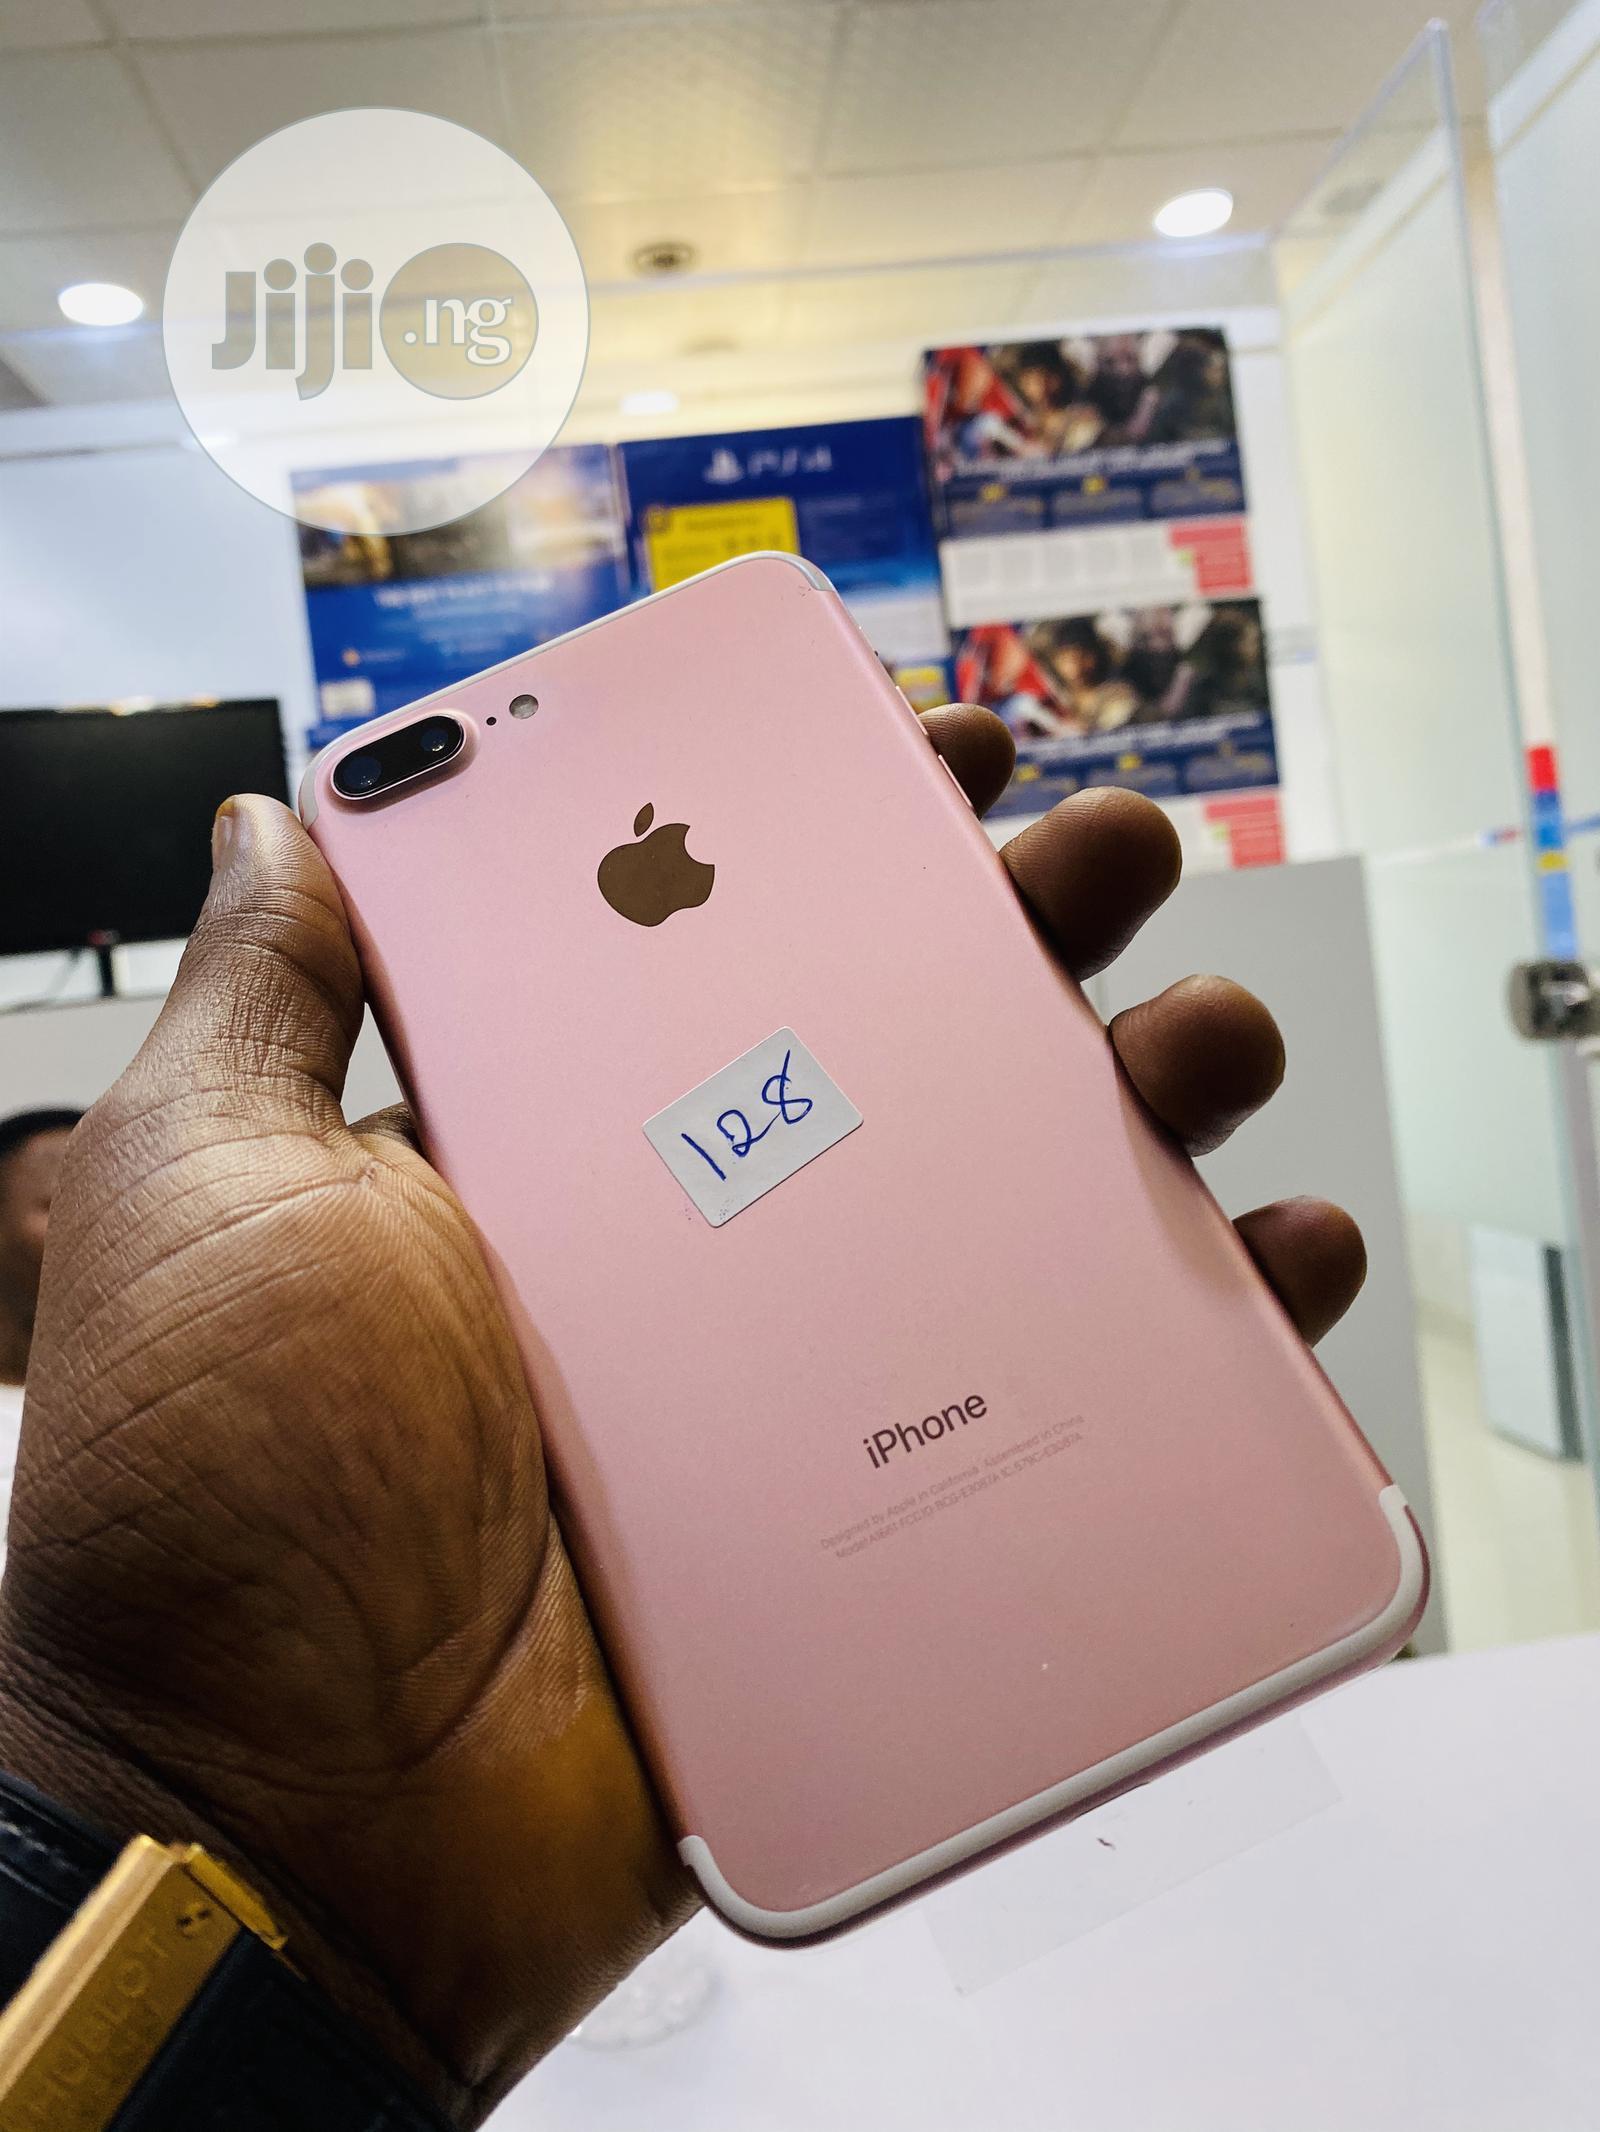 Apple iPhone 7 Plus 128 GB | Mobile Phones for sale in Ibadan, Oyo State, Nigeria